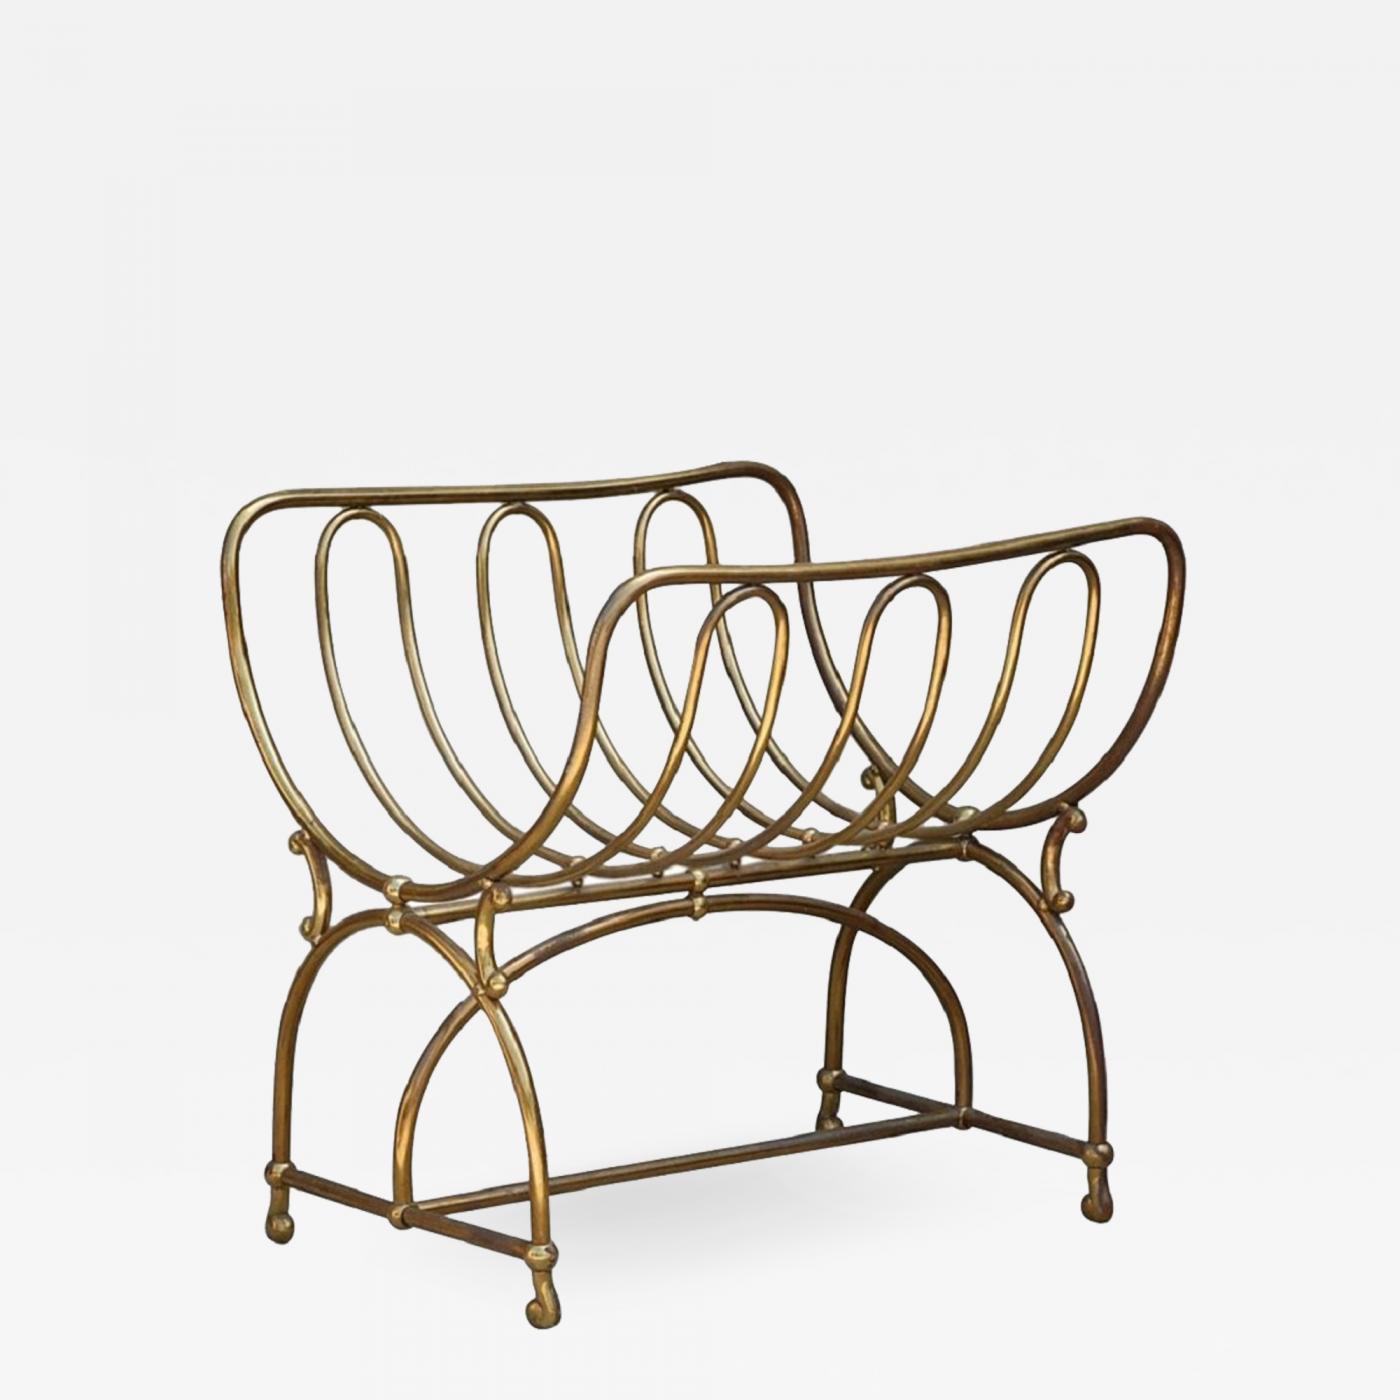 Siegel Paris Unique Solid Brass Fireplace Wood Rack By Siegel